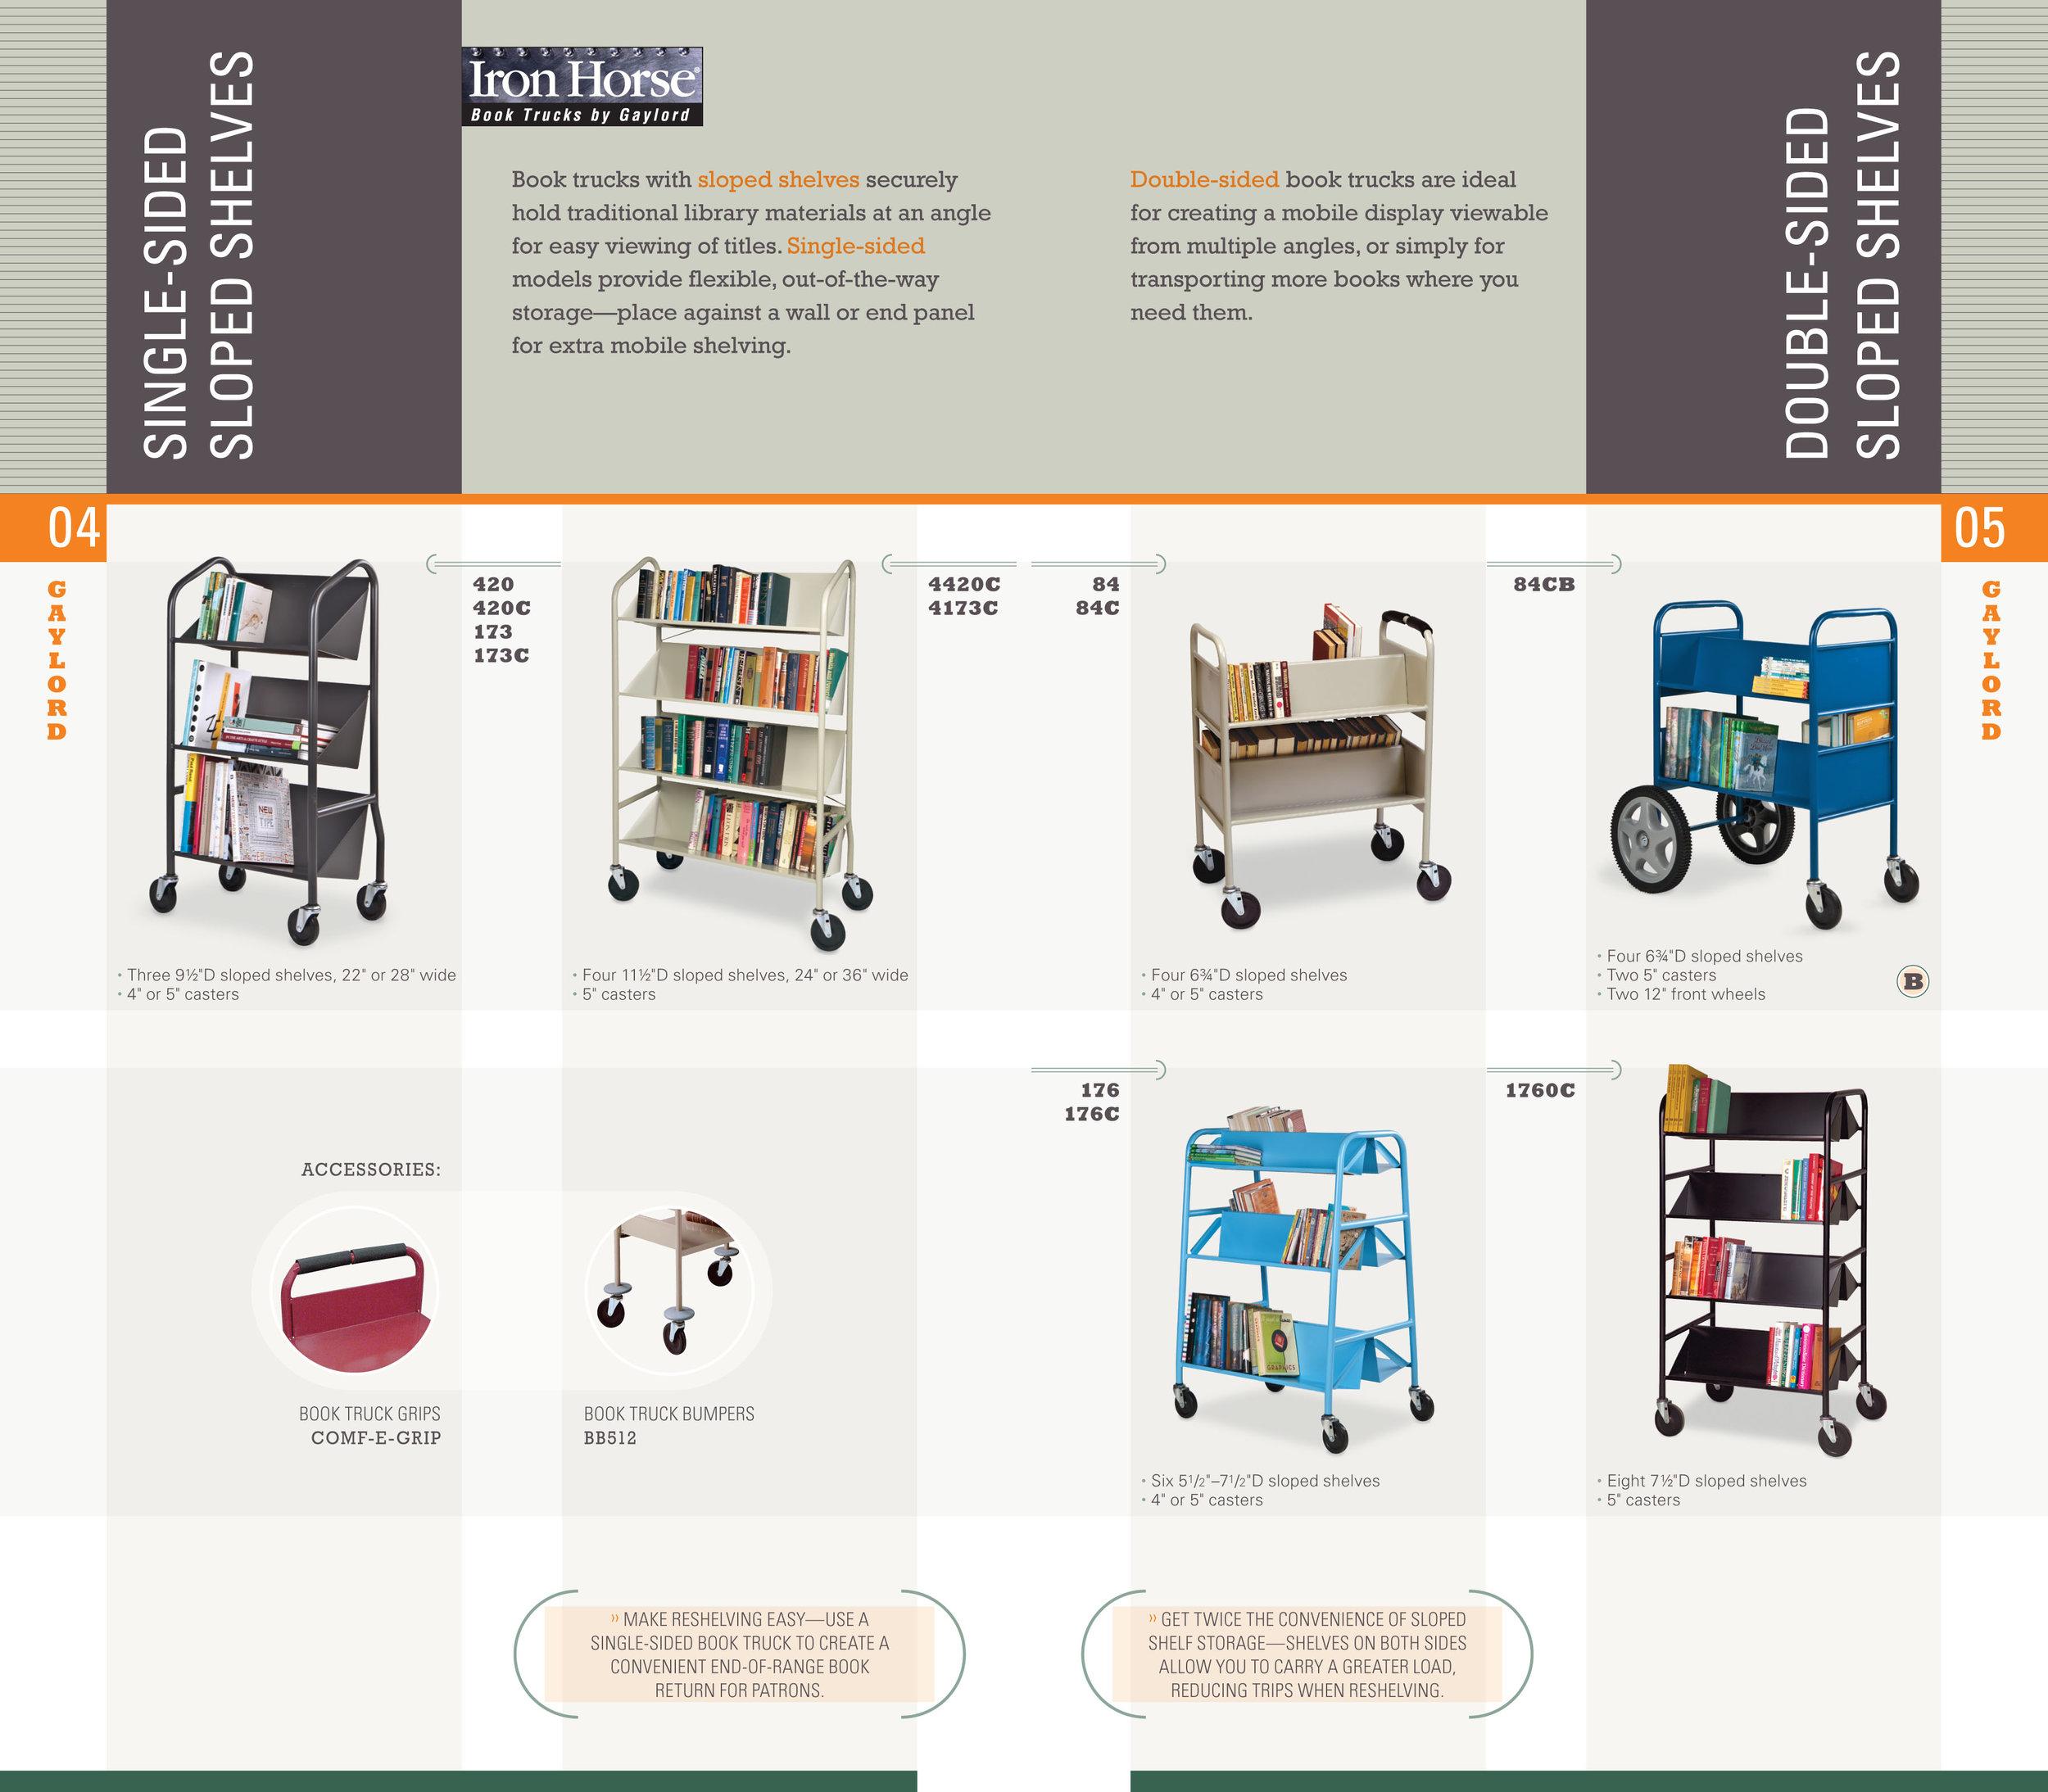 BookTruckBrochure-4-5.jpg